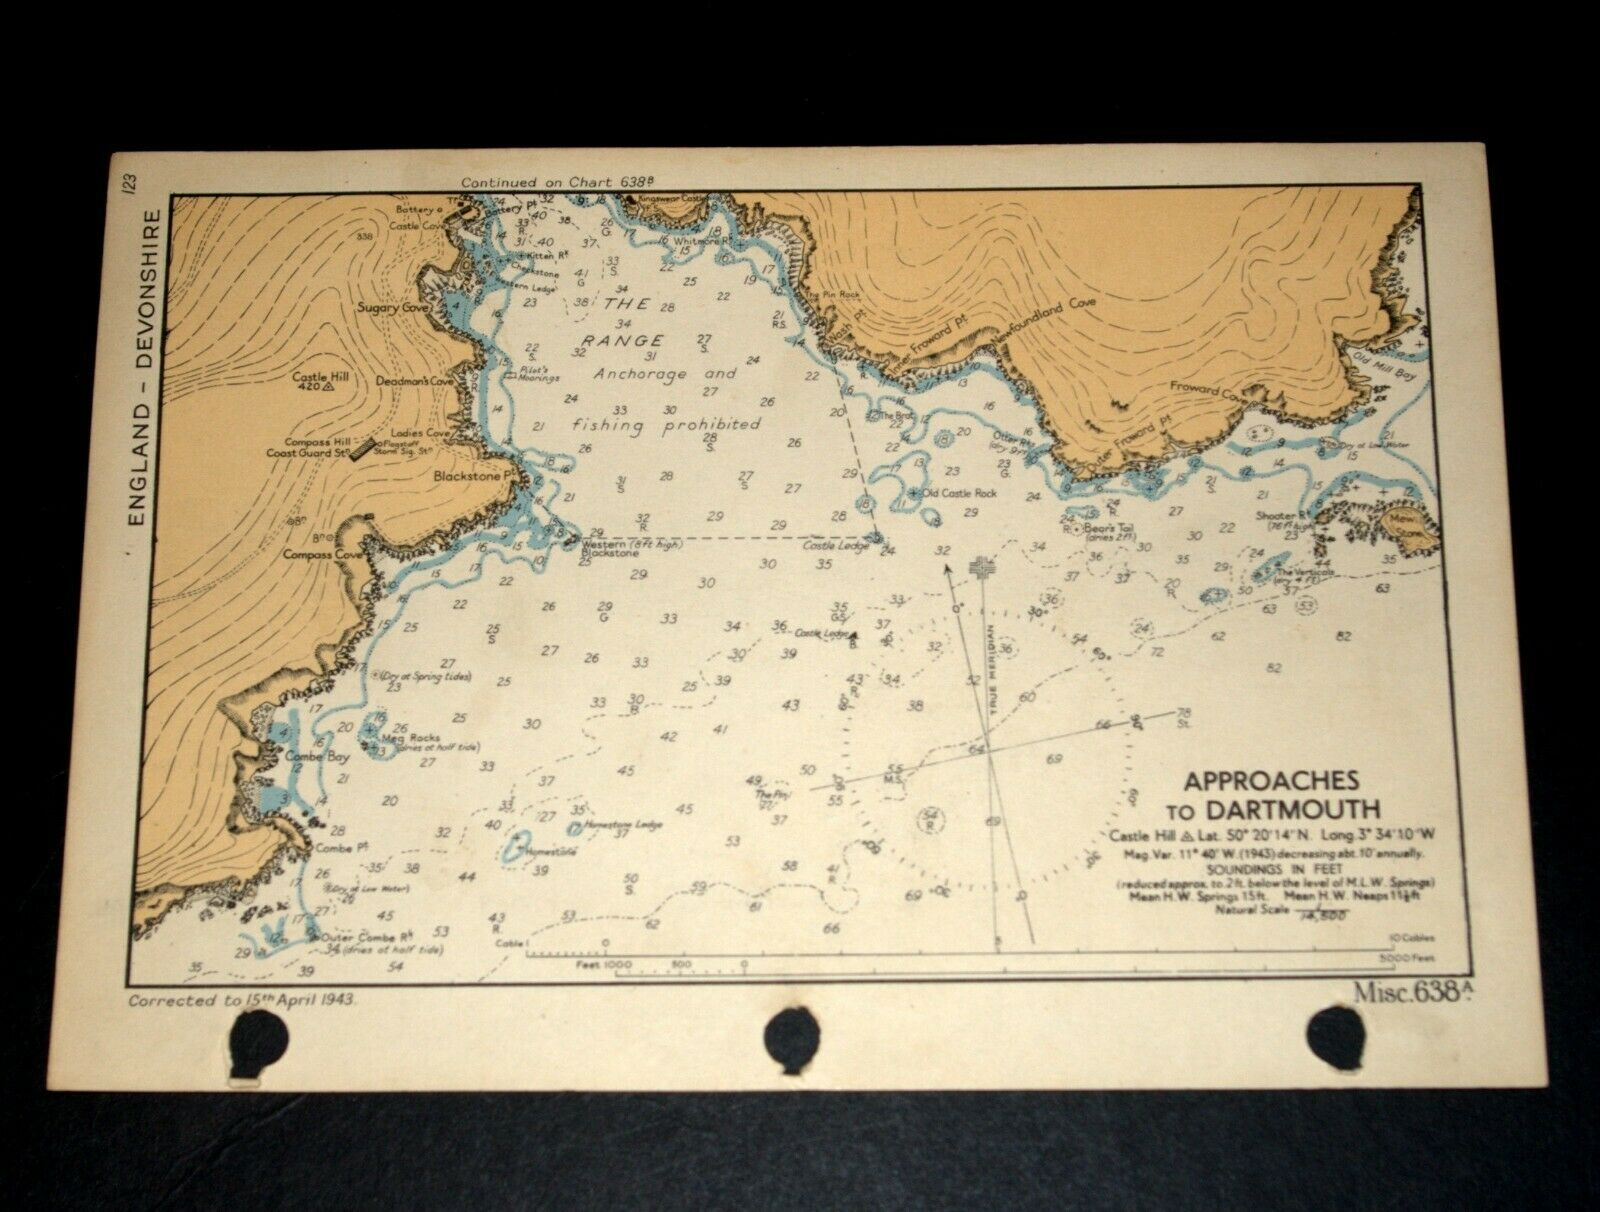 APPROACHES TO DARTMOUTH Devon  Vintage WW2 Naval Military Map 1943